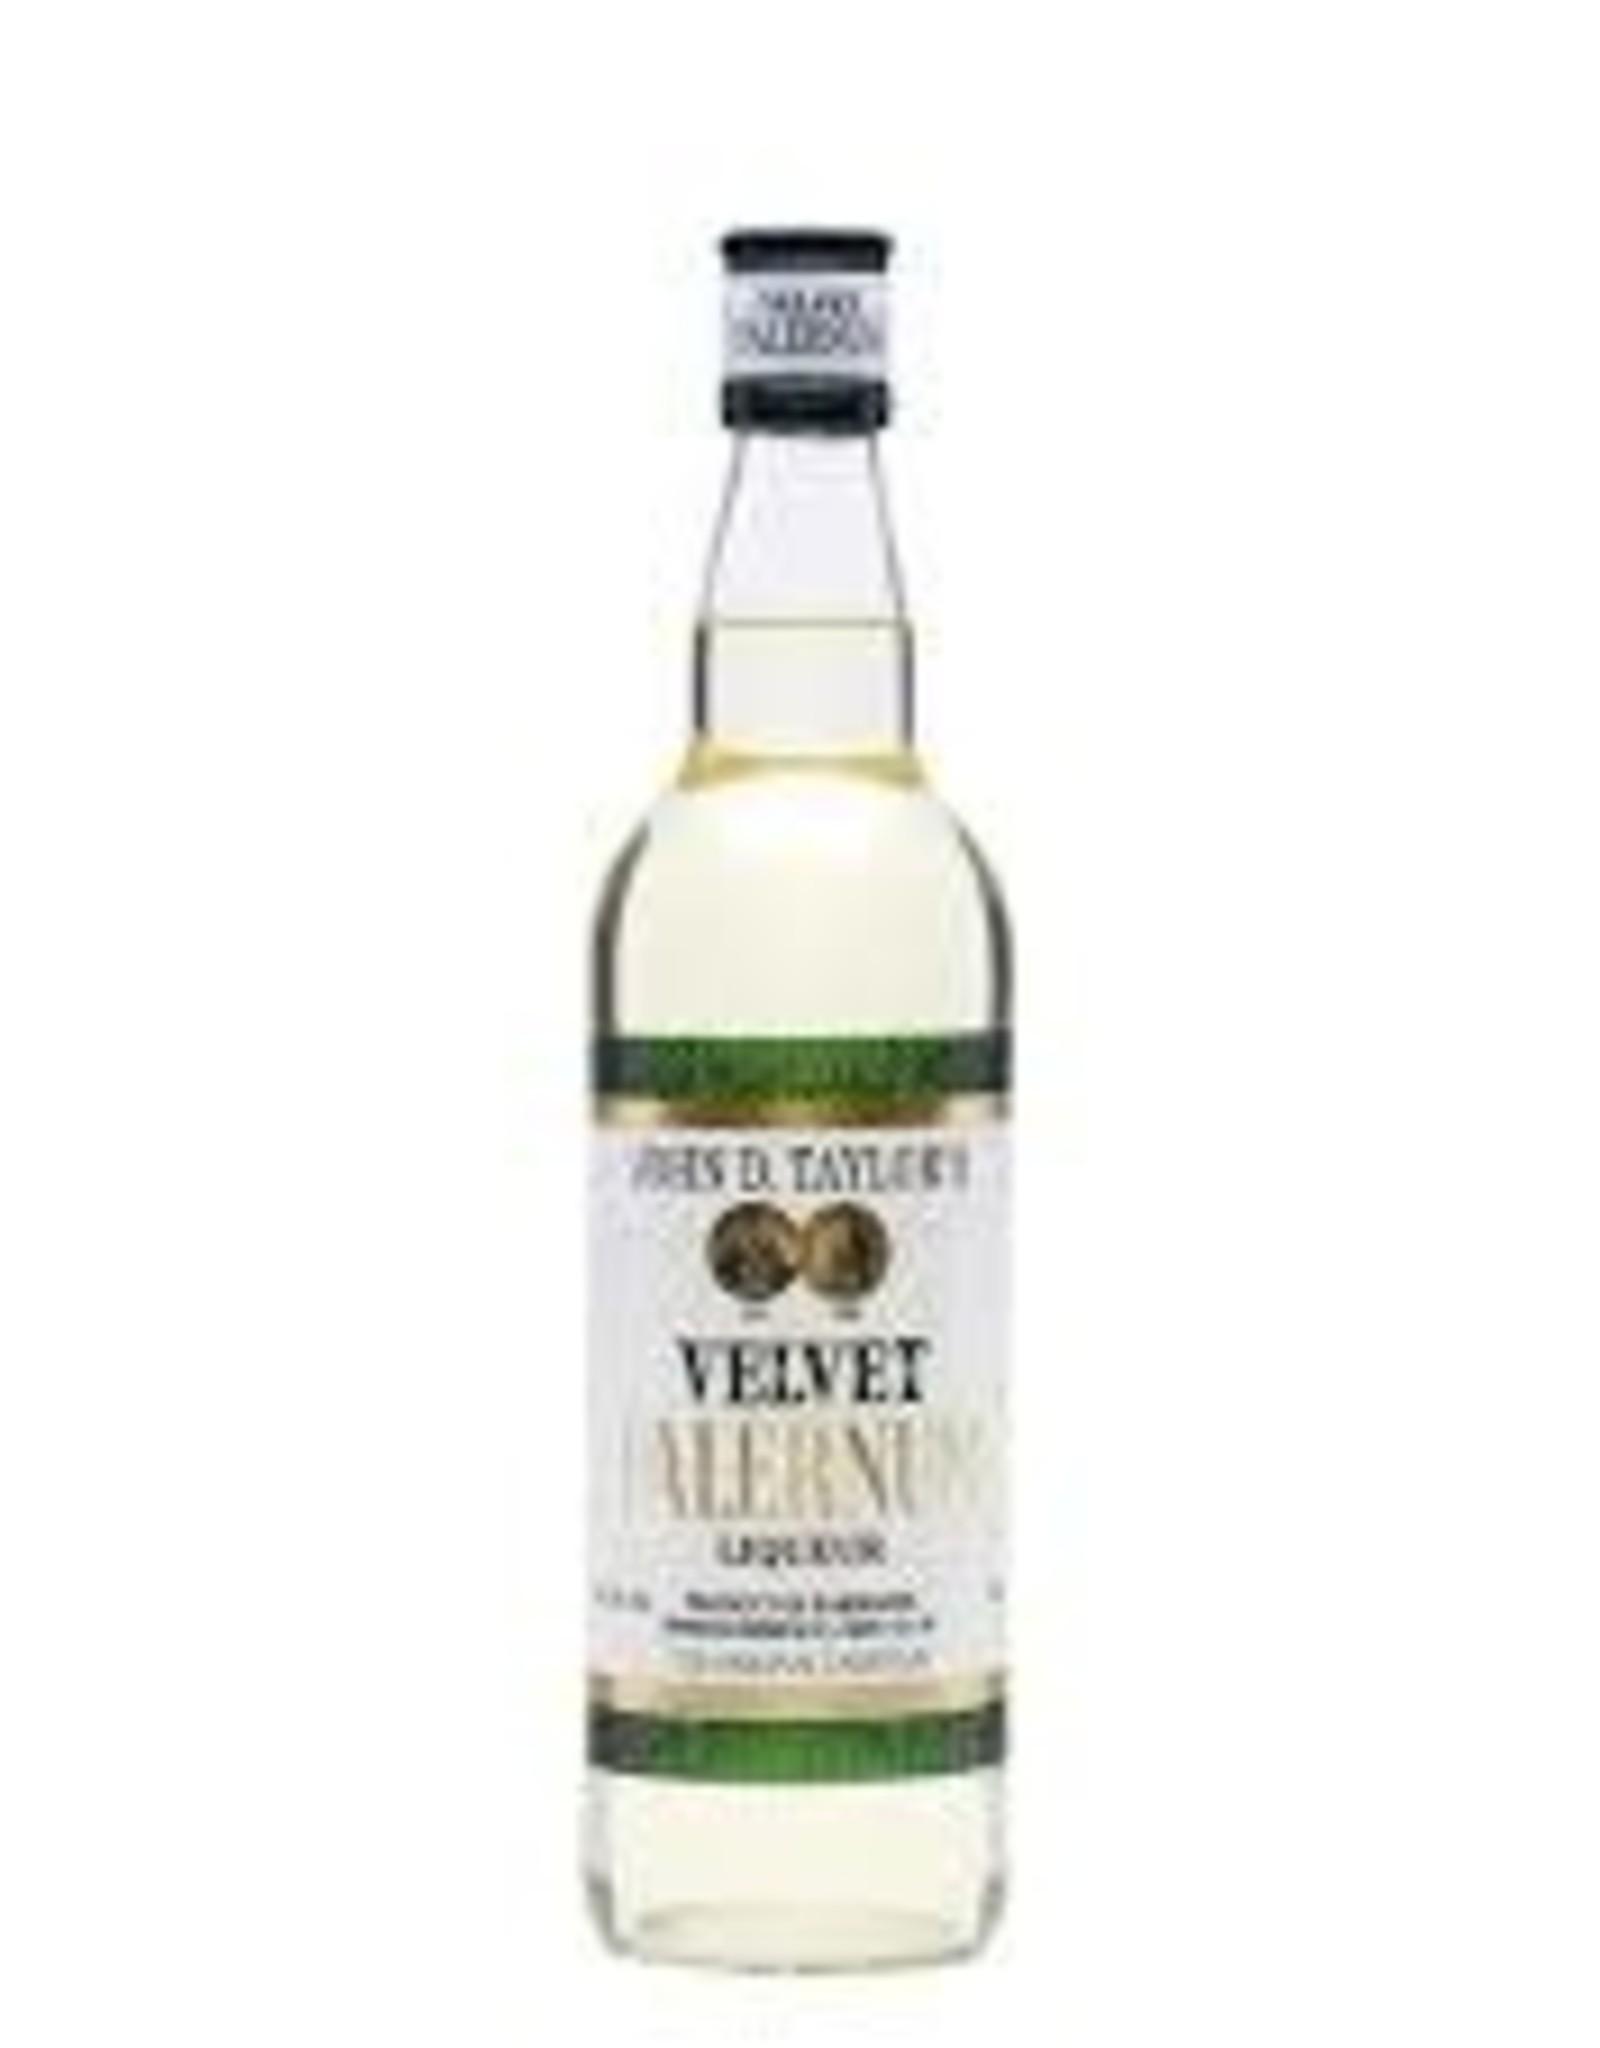 Spirits Rum Liqueur, Barbados, Velvet Falernum, John D Taylor